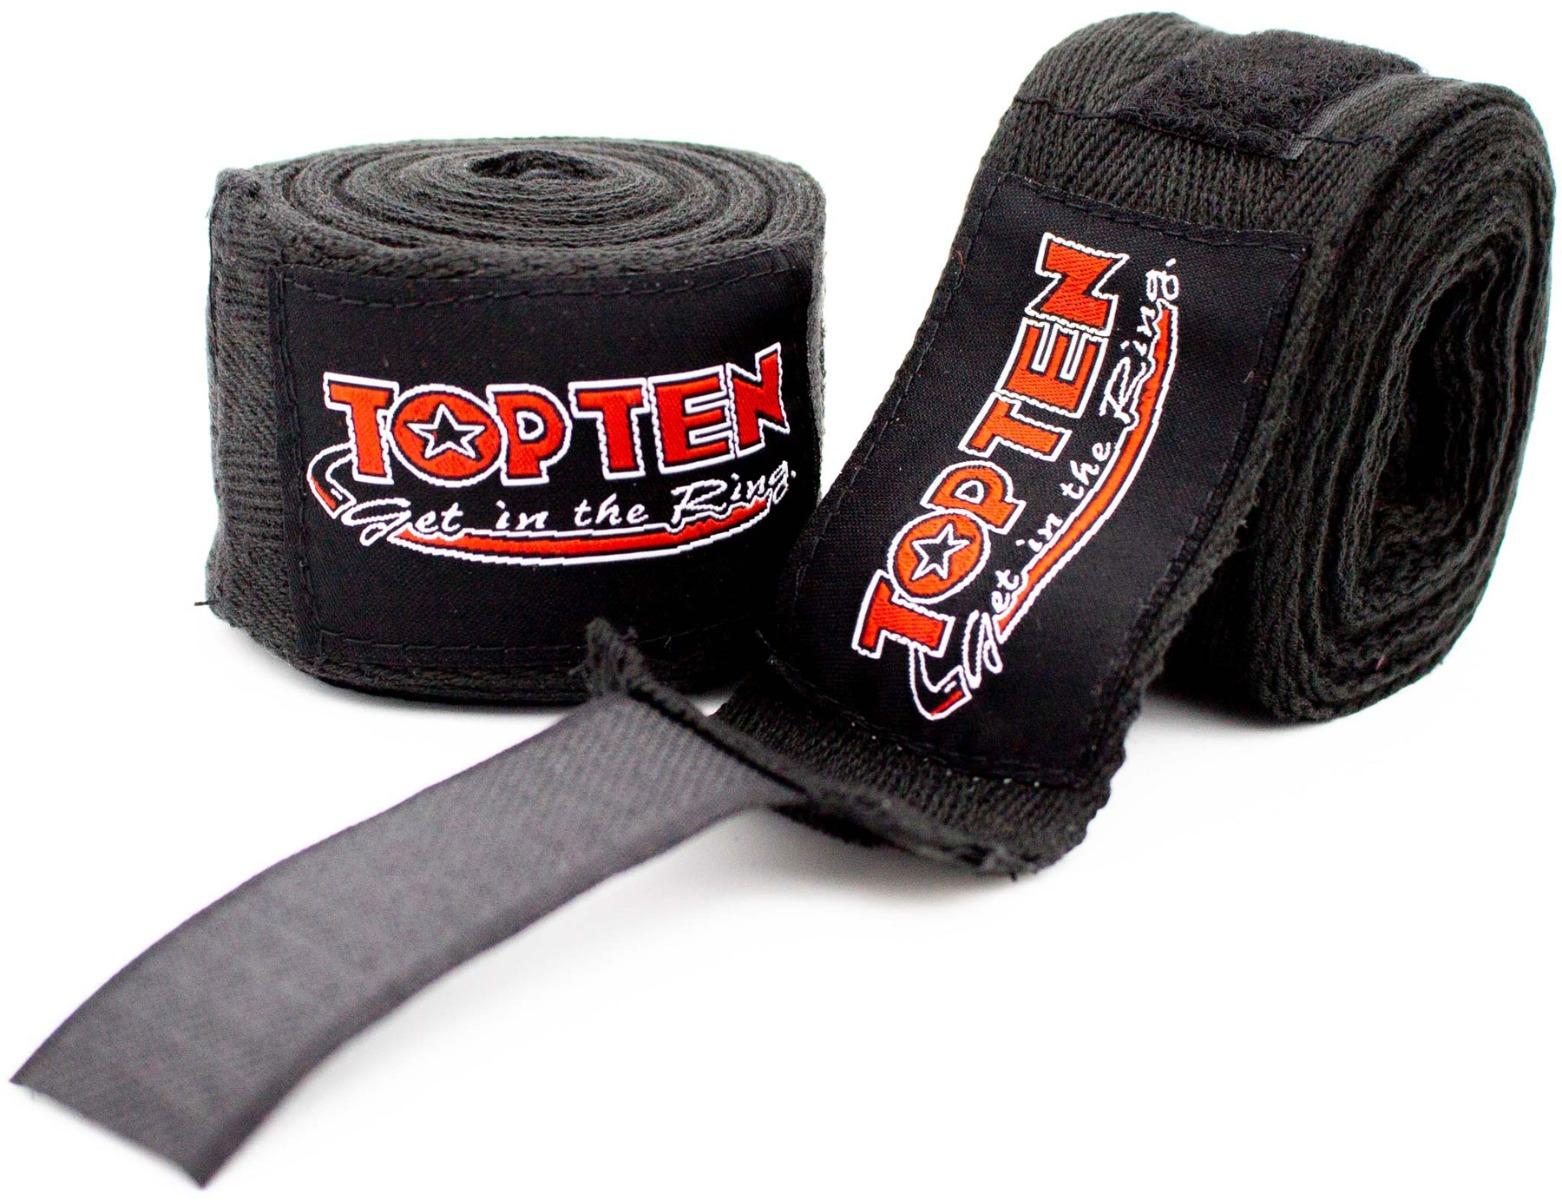 TOP TEN Boksbandage  boxing bandage inelastic Zwart